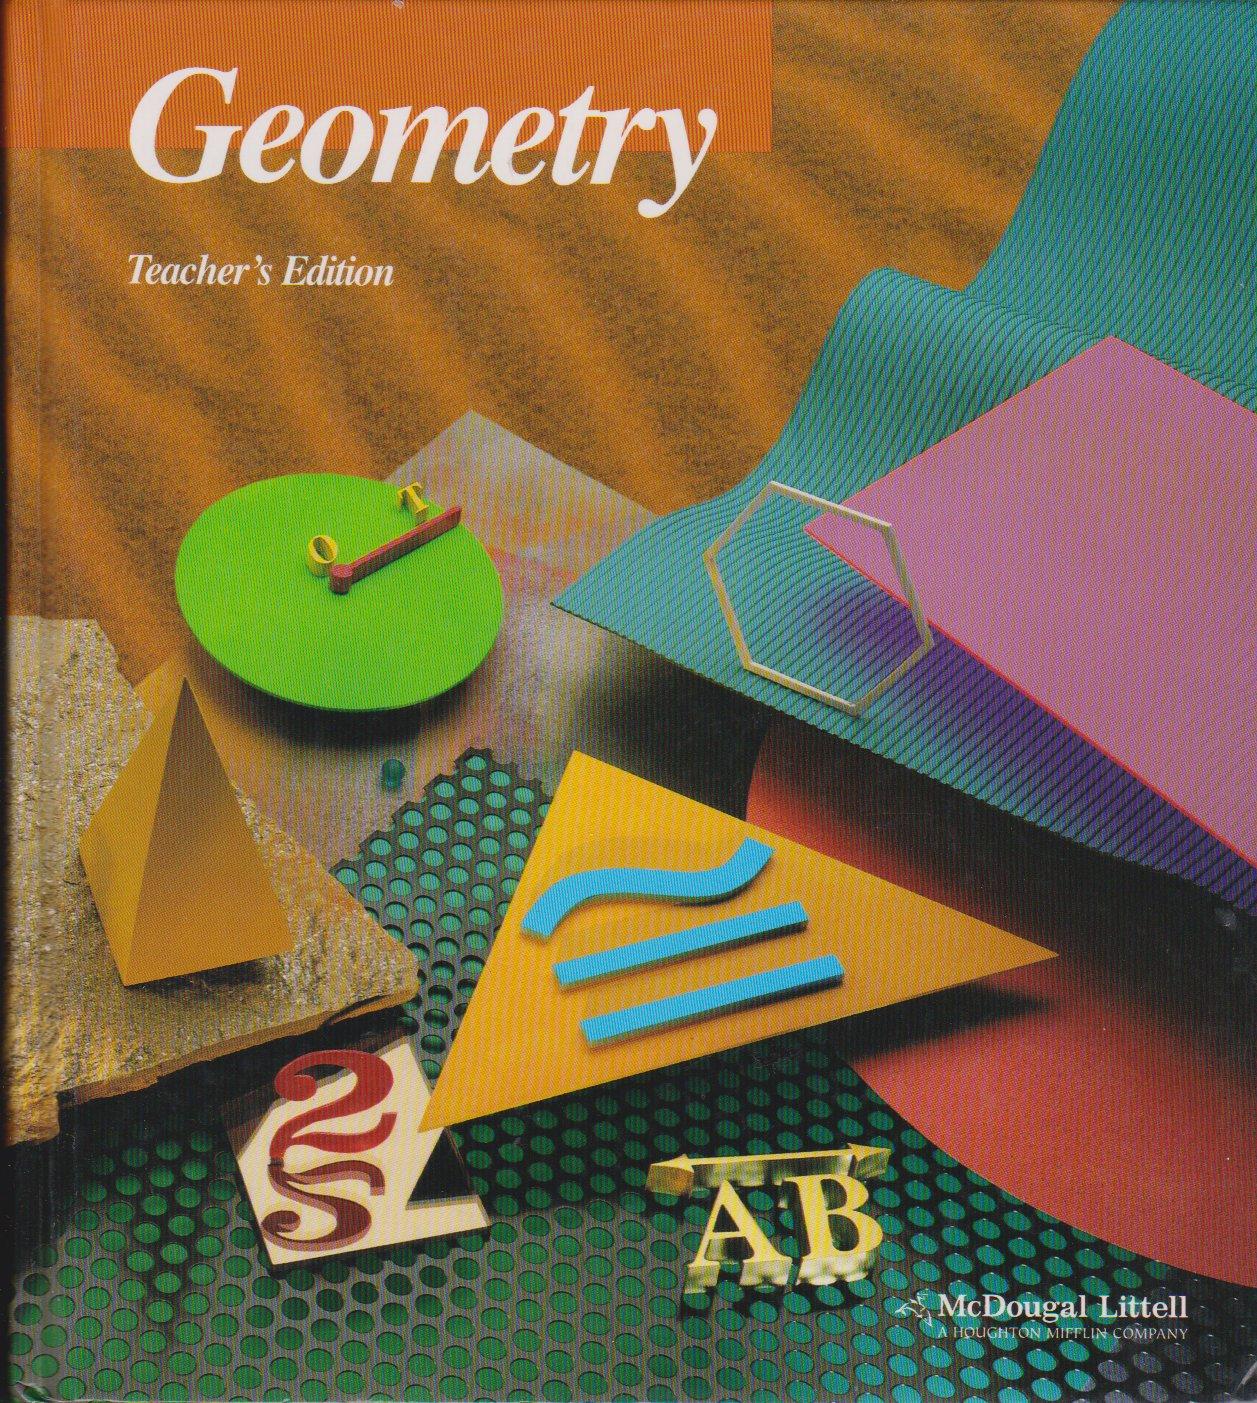 Workbooks geometry workbook mcdougal littell answer key : McDougal Littell Geometry TE: Ray C. Jurgensen, Richard G. Brown ...